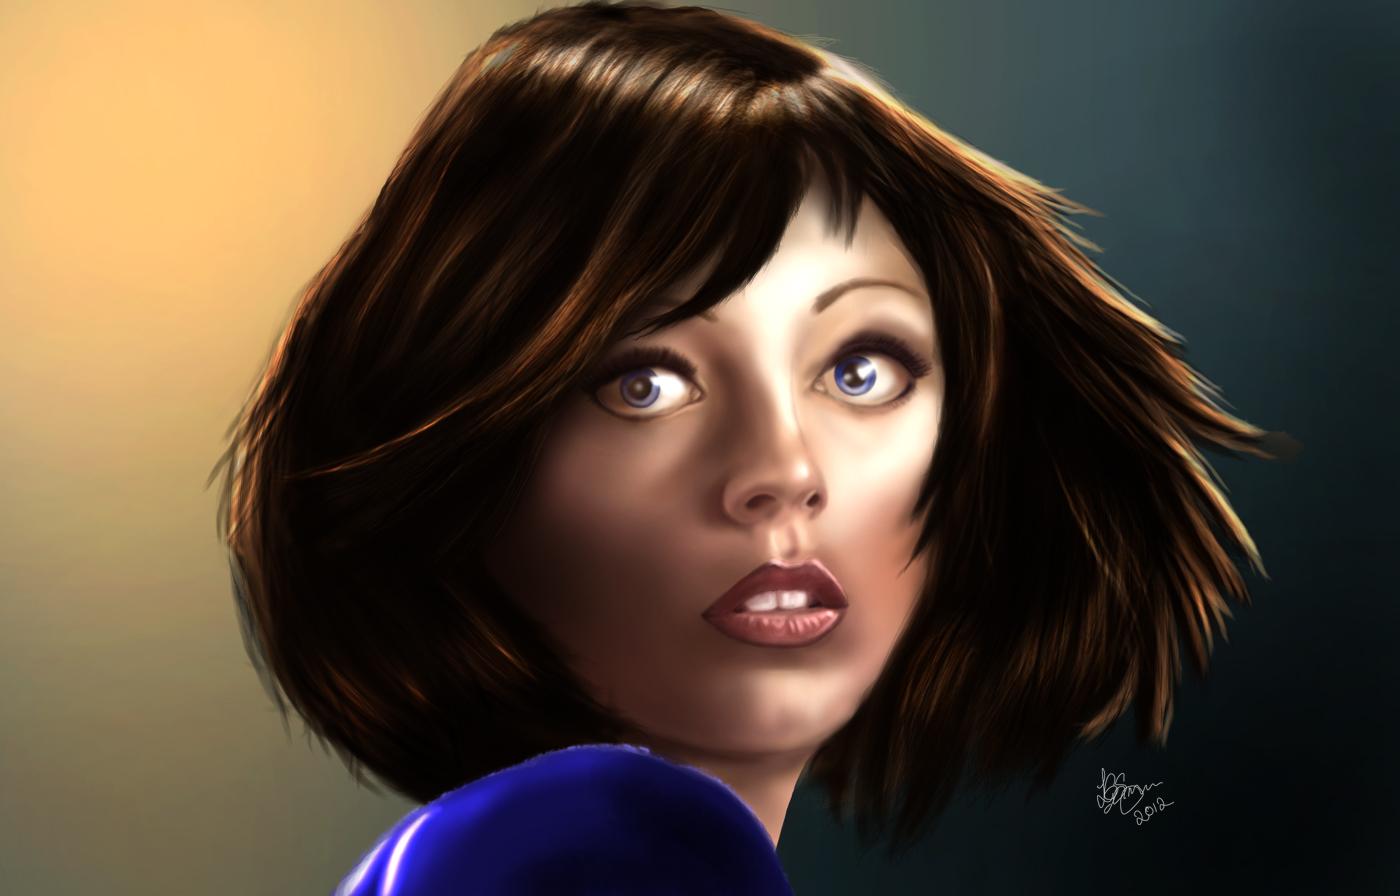 Elizabeth - Bioshock Infinite by Unam-et-solum